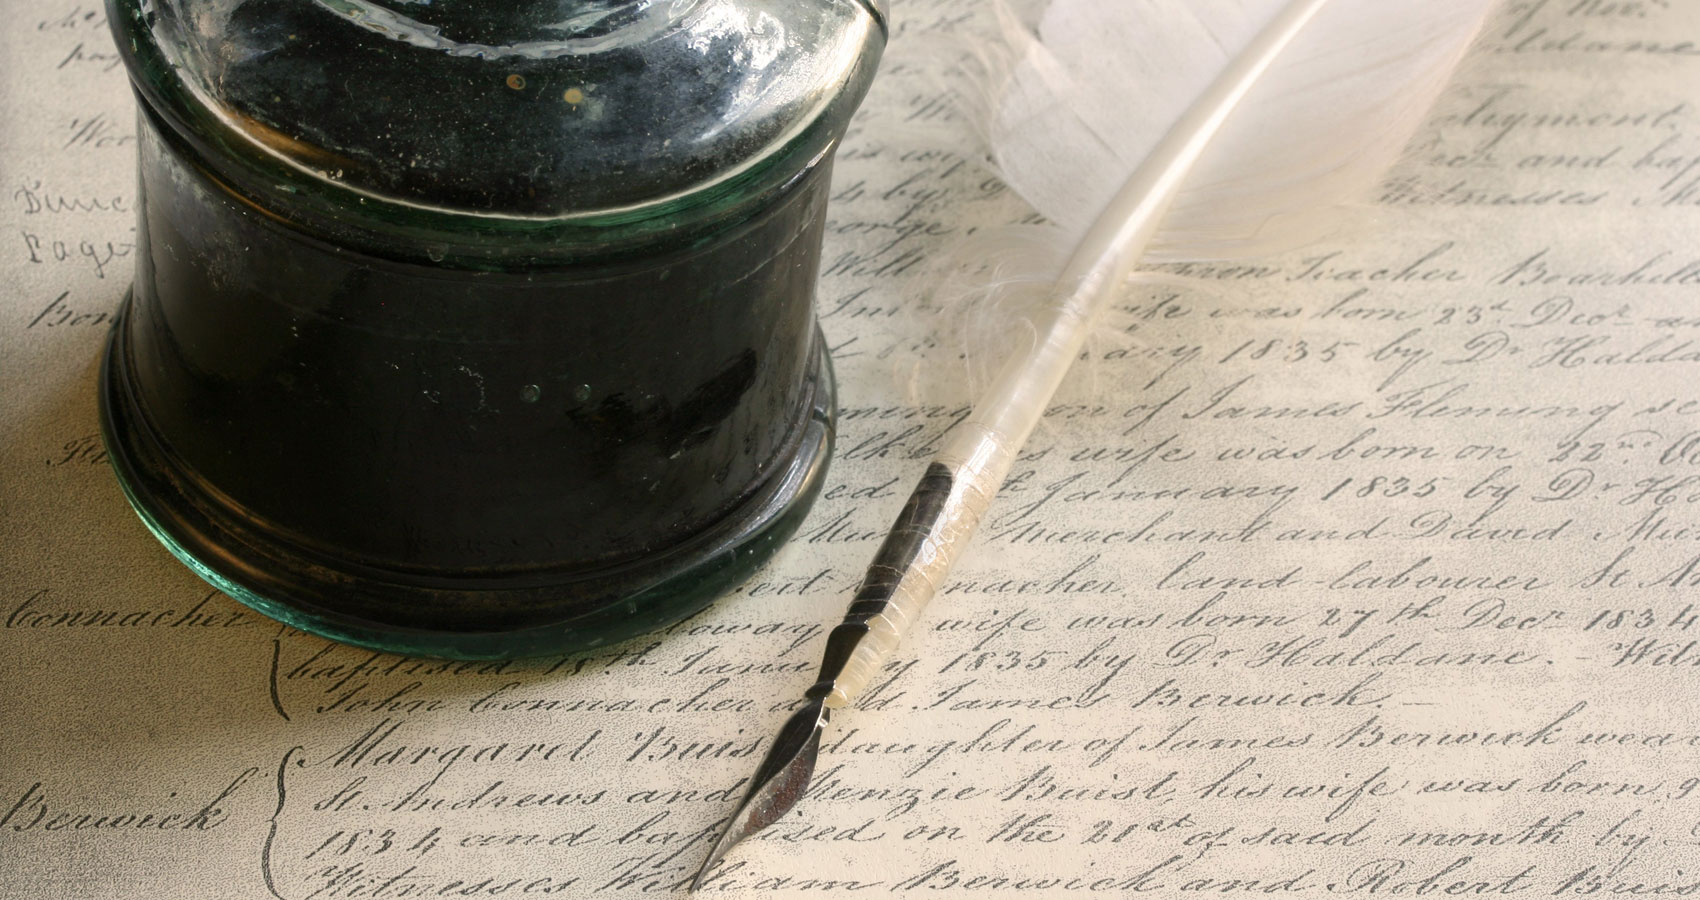 The Unspoken Poem by Ronald Allen Bell at Spillwords.com